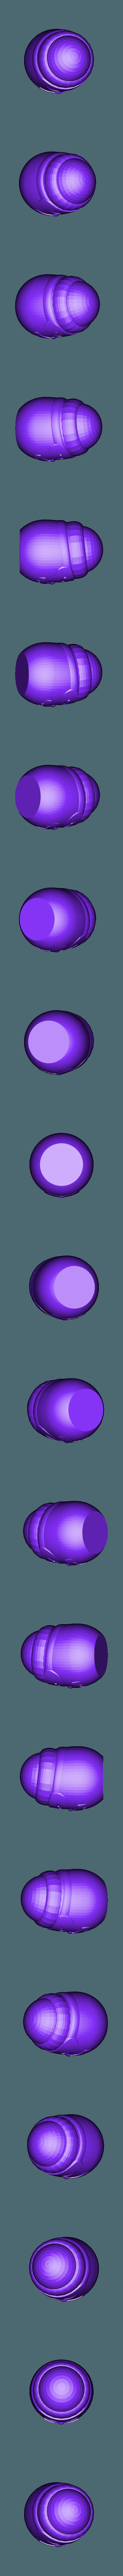 Rotton_Guy_4.stl Download free STL file Rotton Eggs! • 3D printer model, 8ran